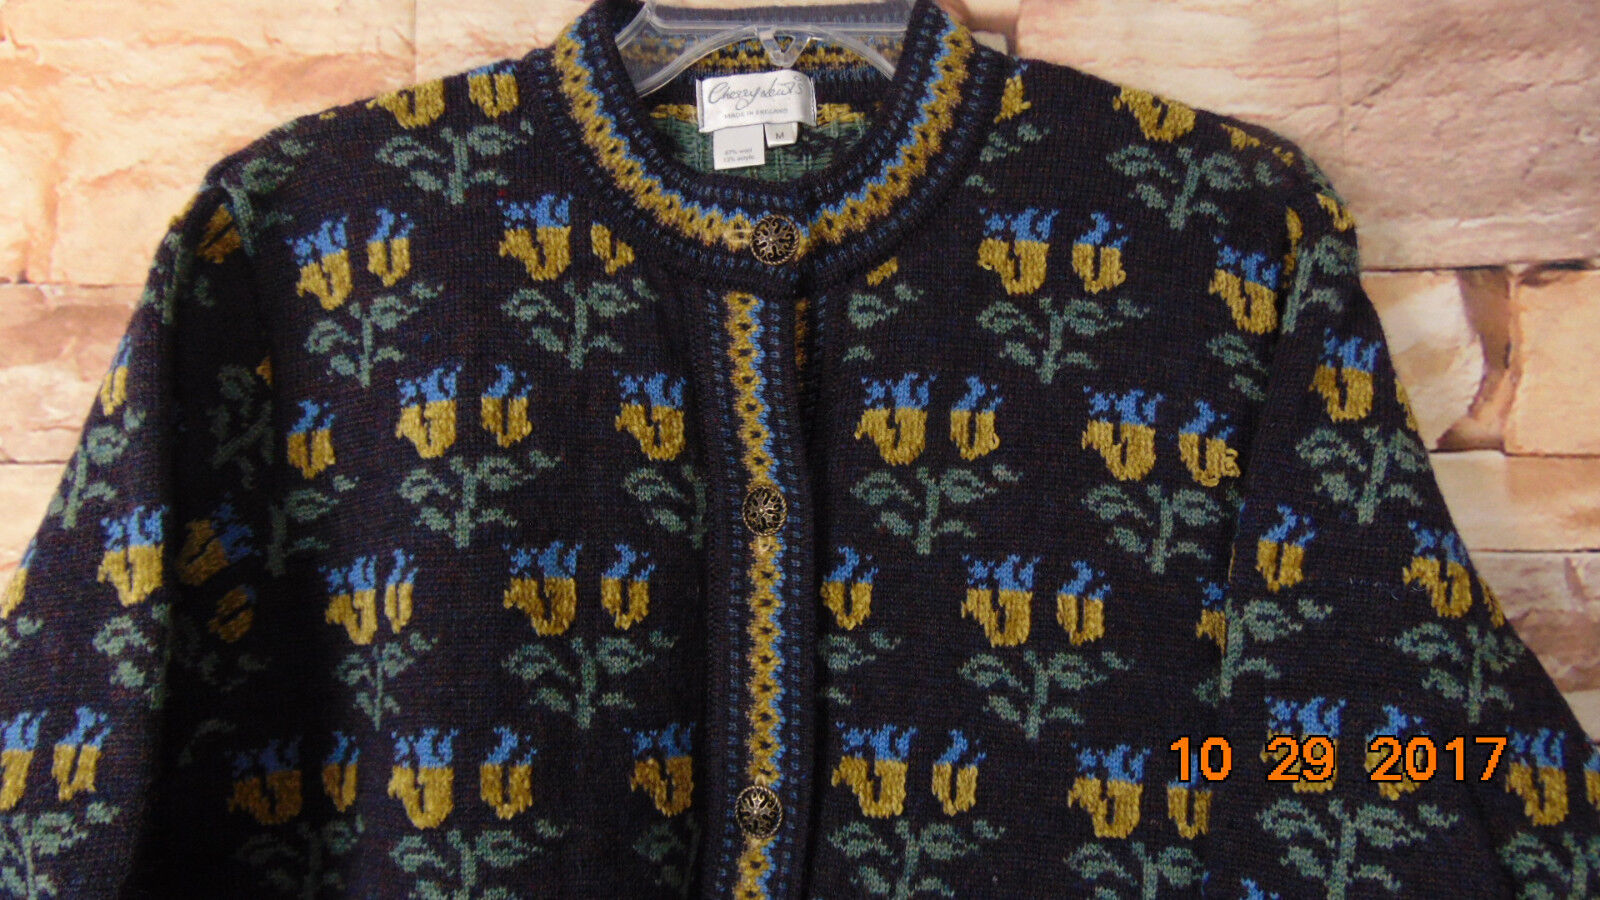 CHERRY LEWIS Grey Print Wool Acrylic Cardigan Sweater - Sz M